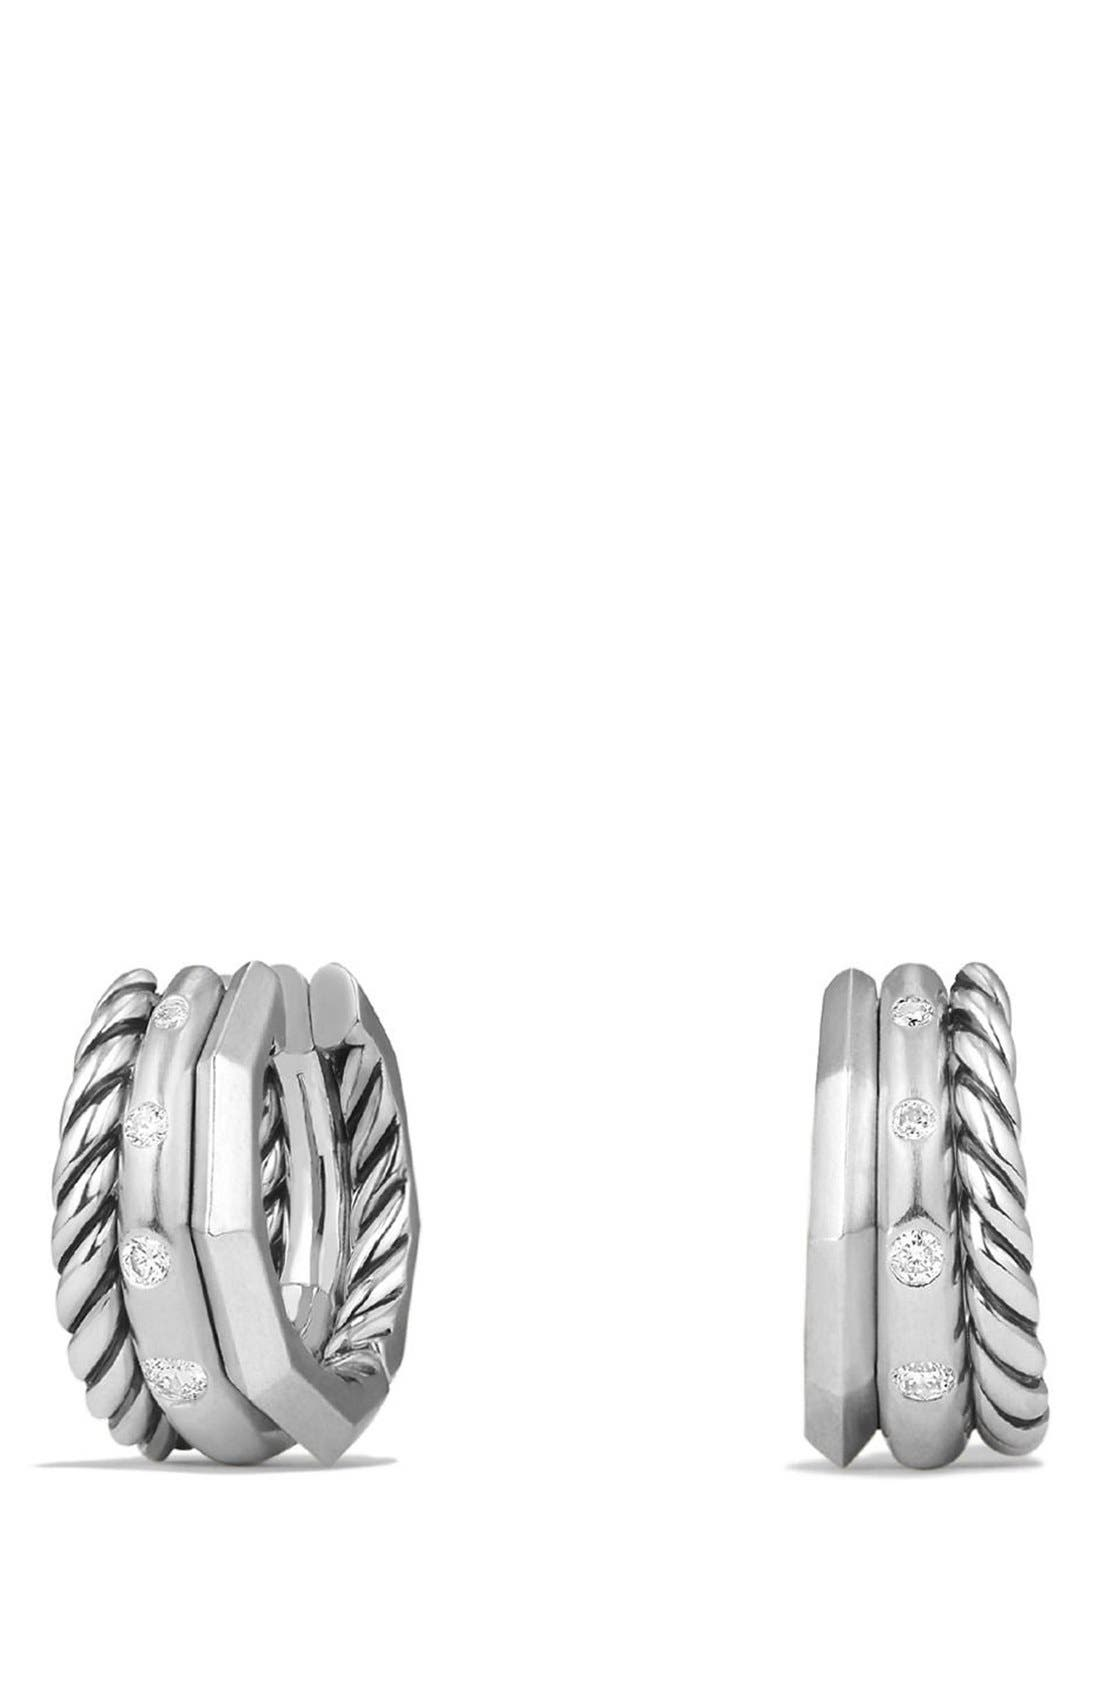 David Yurman 'Stax' Diamond Hoop Earrings